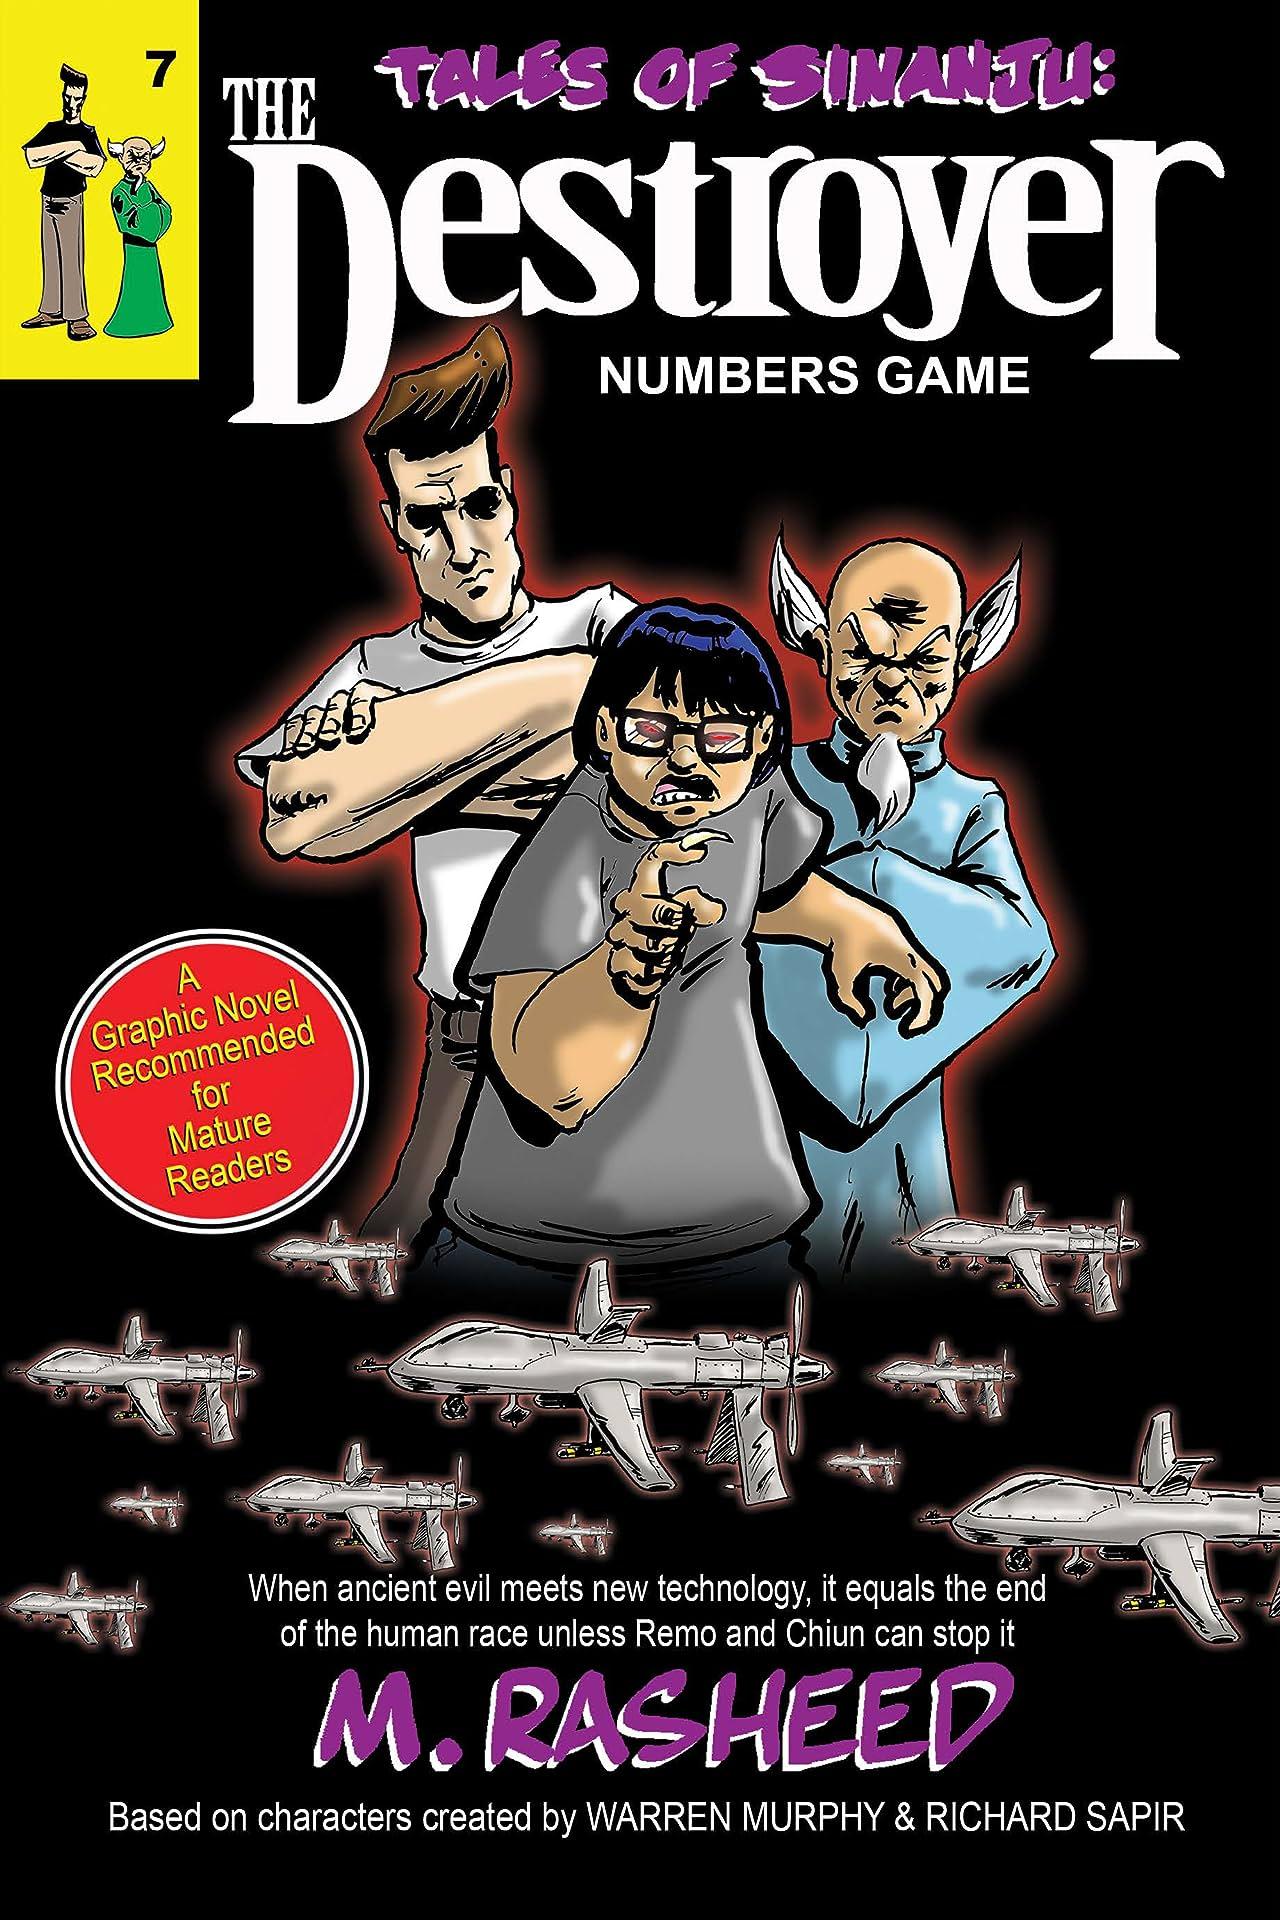 Tales of Sinanju: The Destroyer Vol. 7: Numbers Game